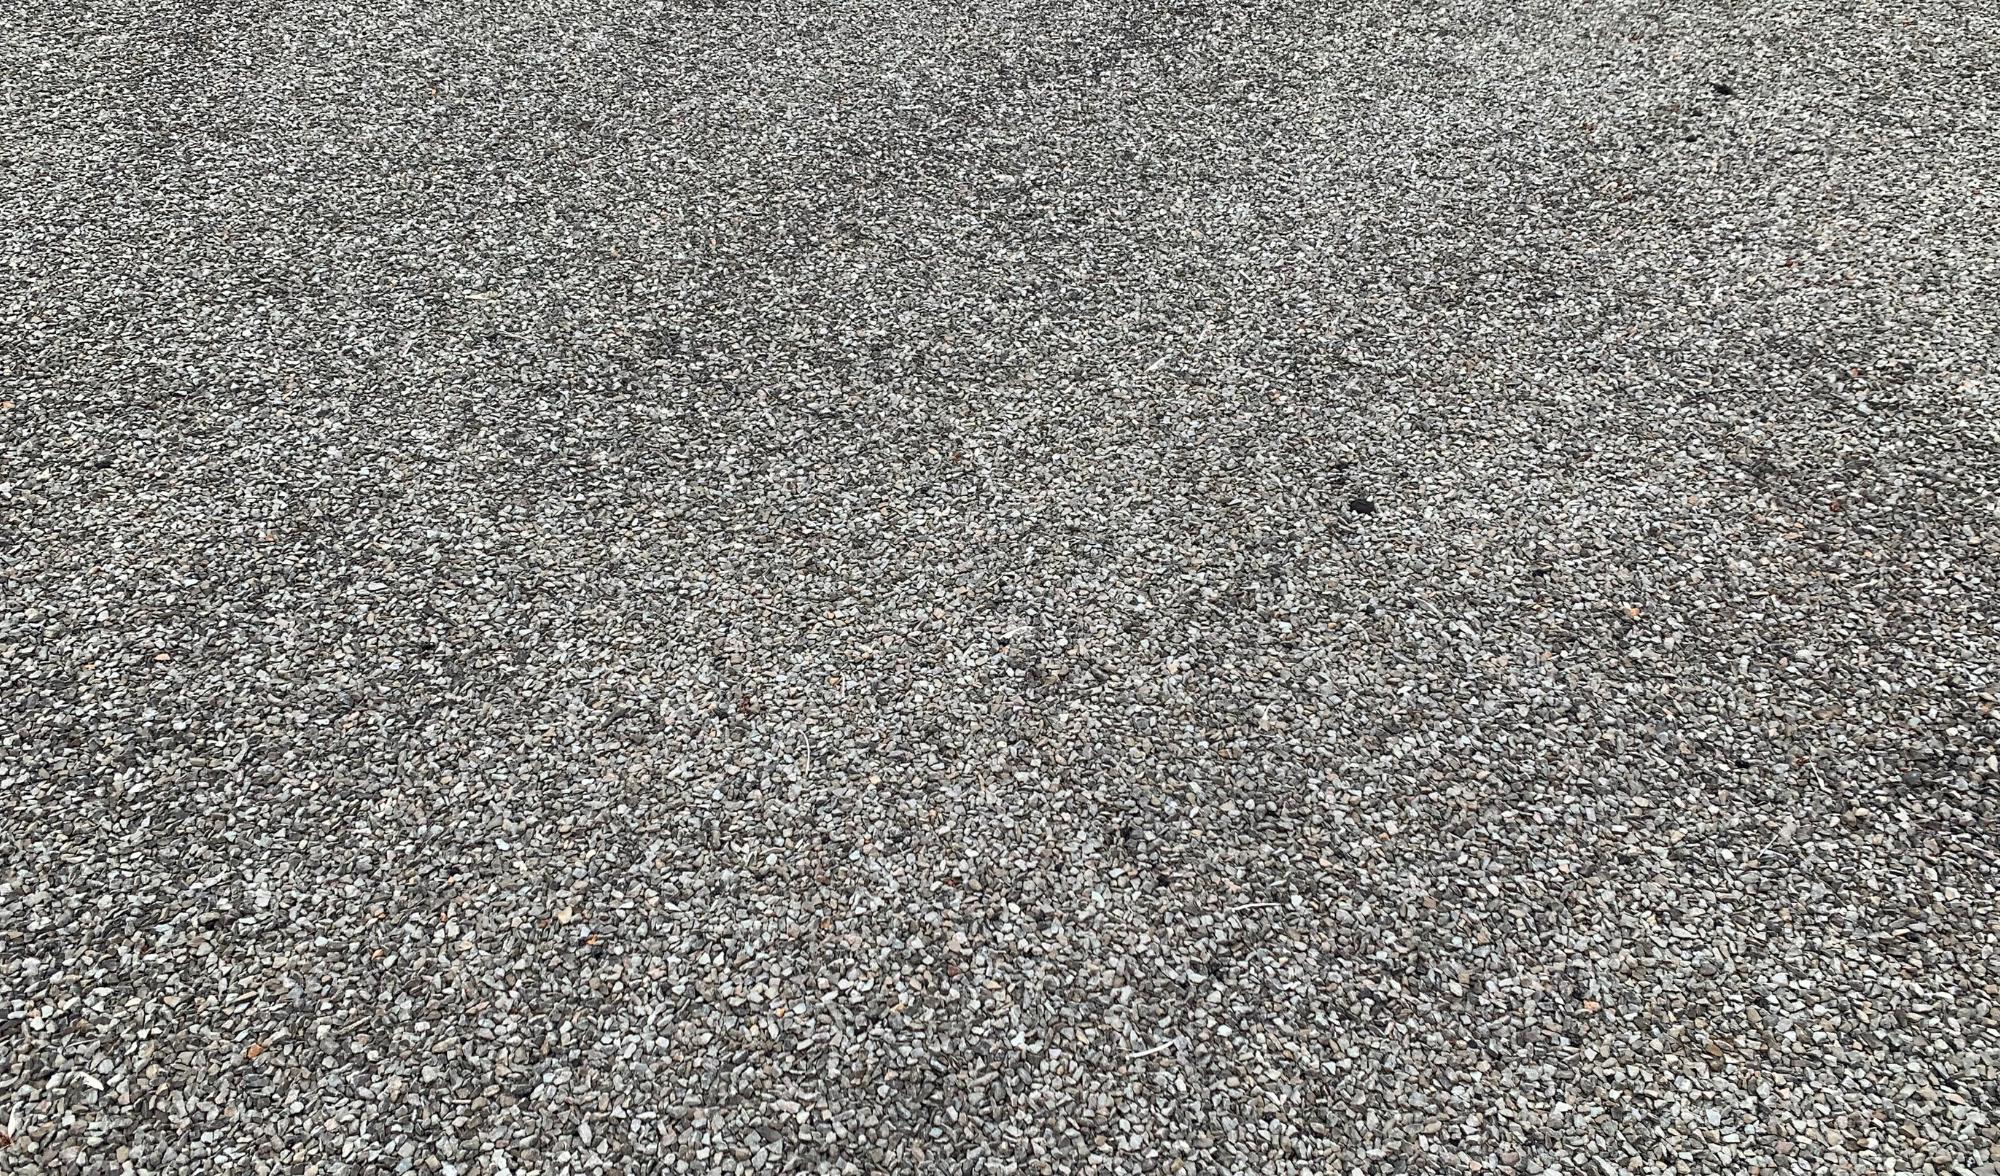 Toit plat en asphalte-gravier